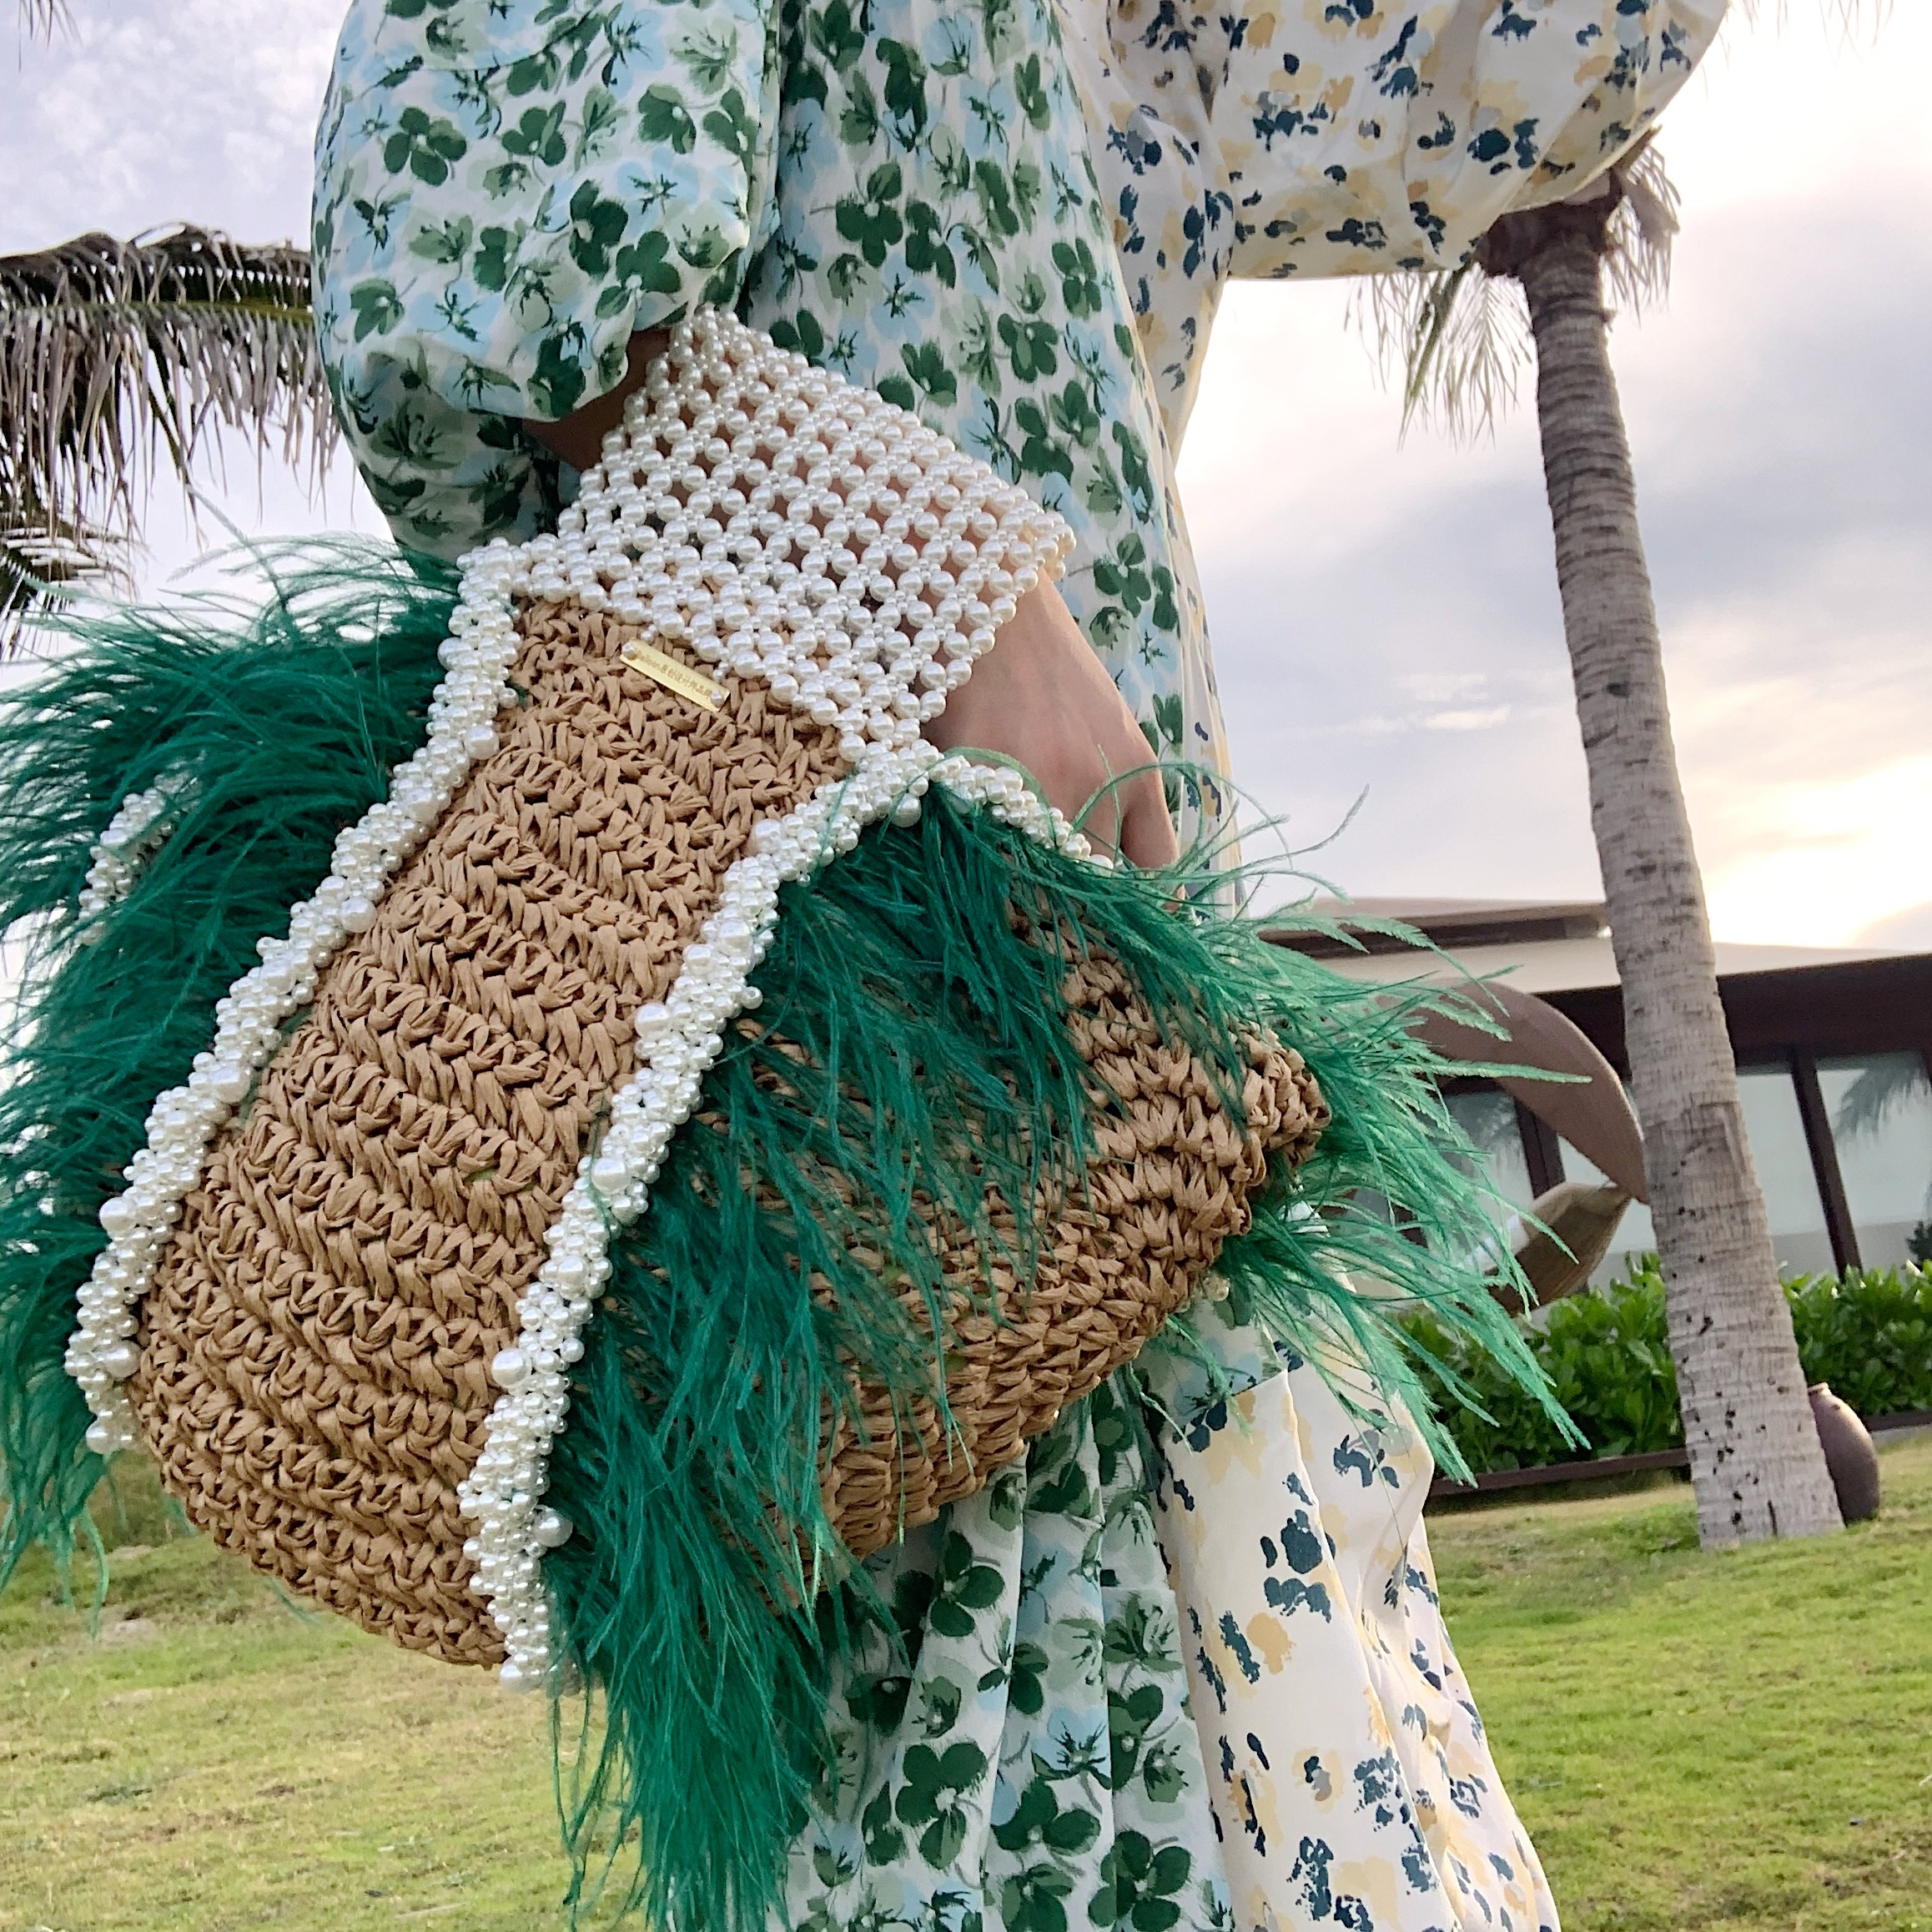 Handmade peacock green ostrich hair pearl natural grass weave bag Summer Beach Bags 2020 New Holiday Women Straw Woven Handbags